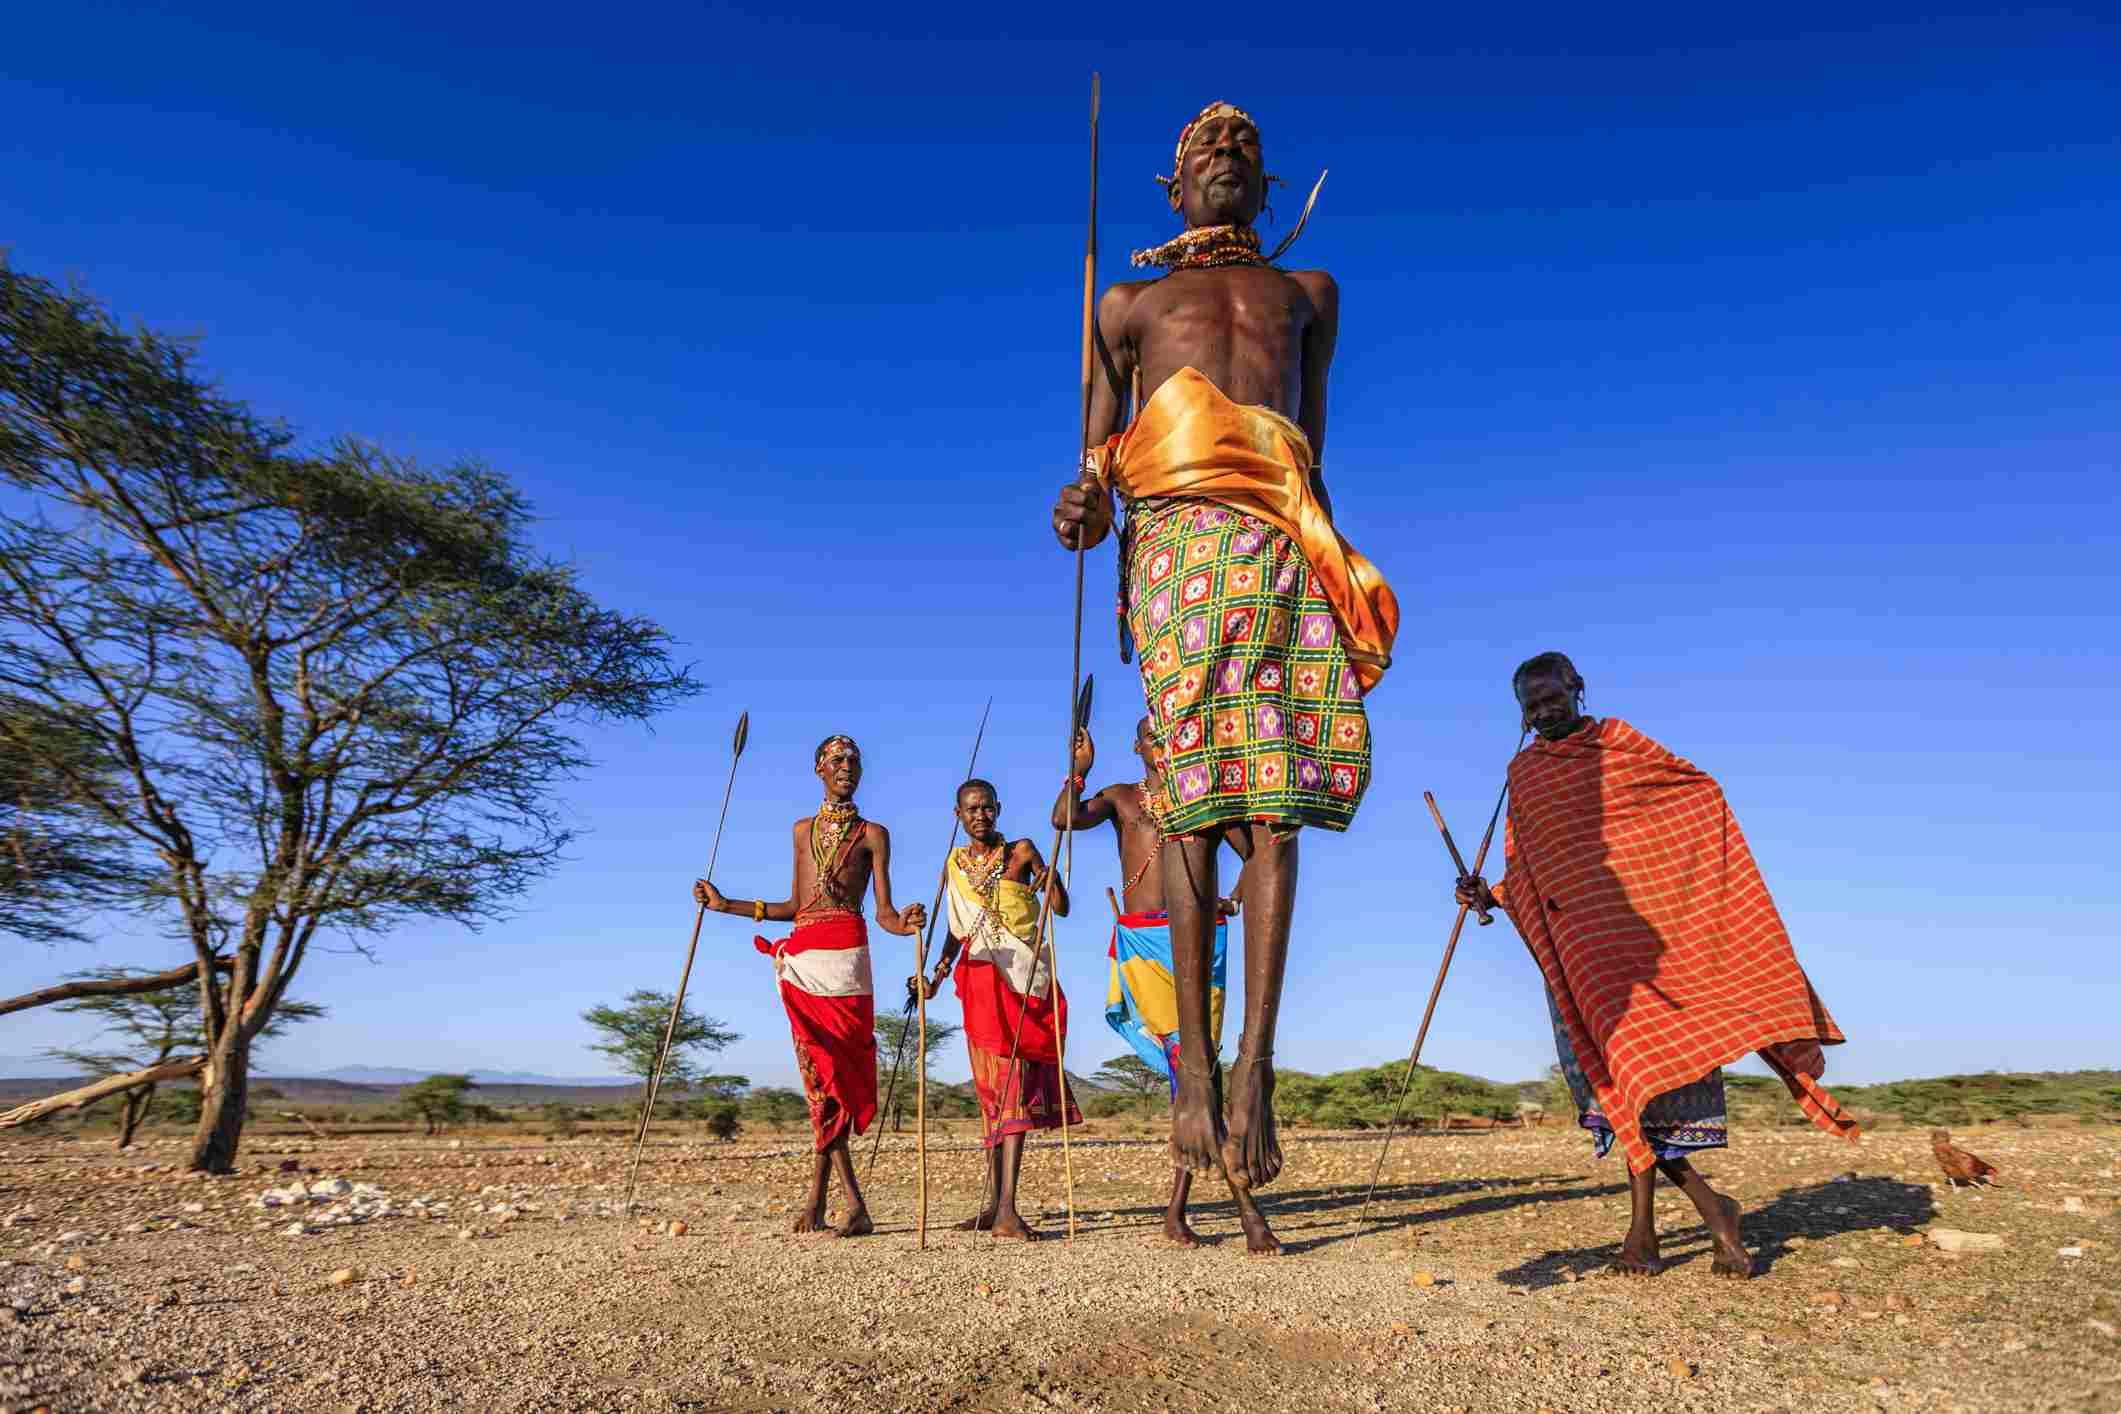 Samburu warriors performing a traditional dance, northern Kenya